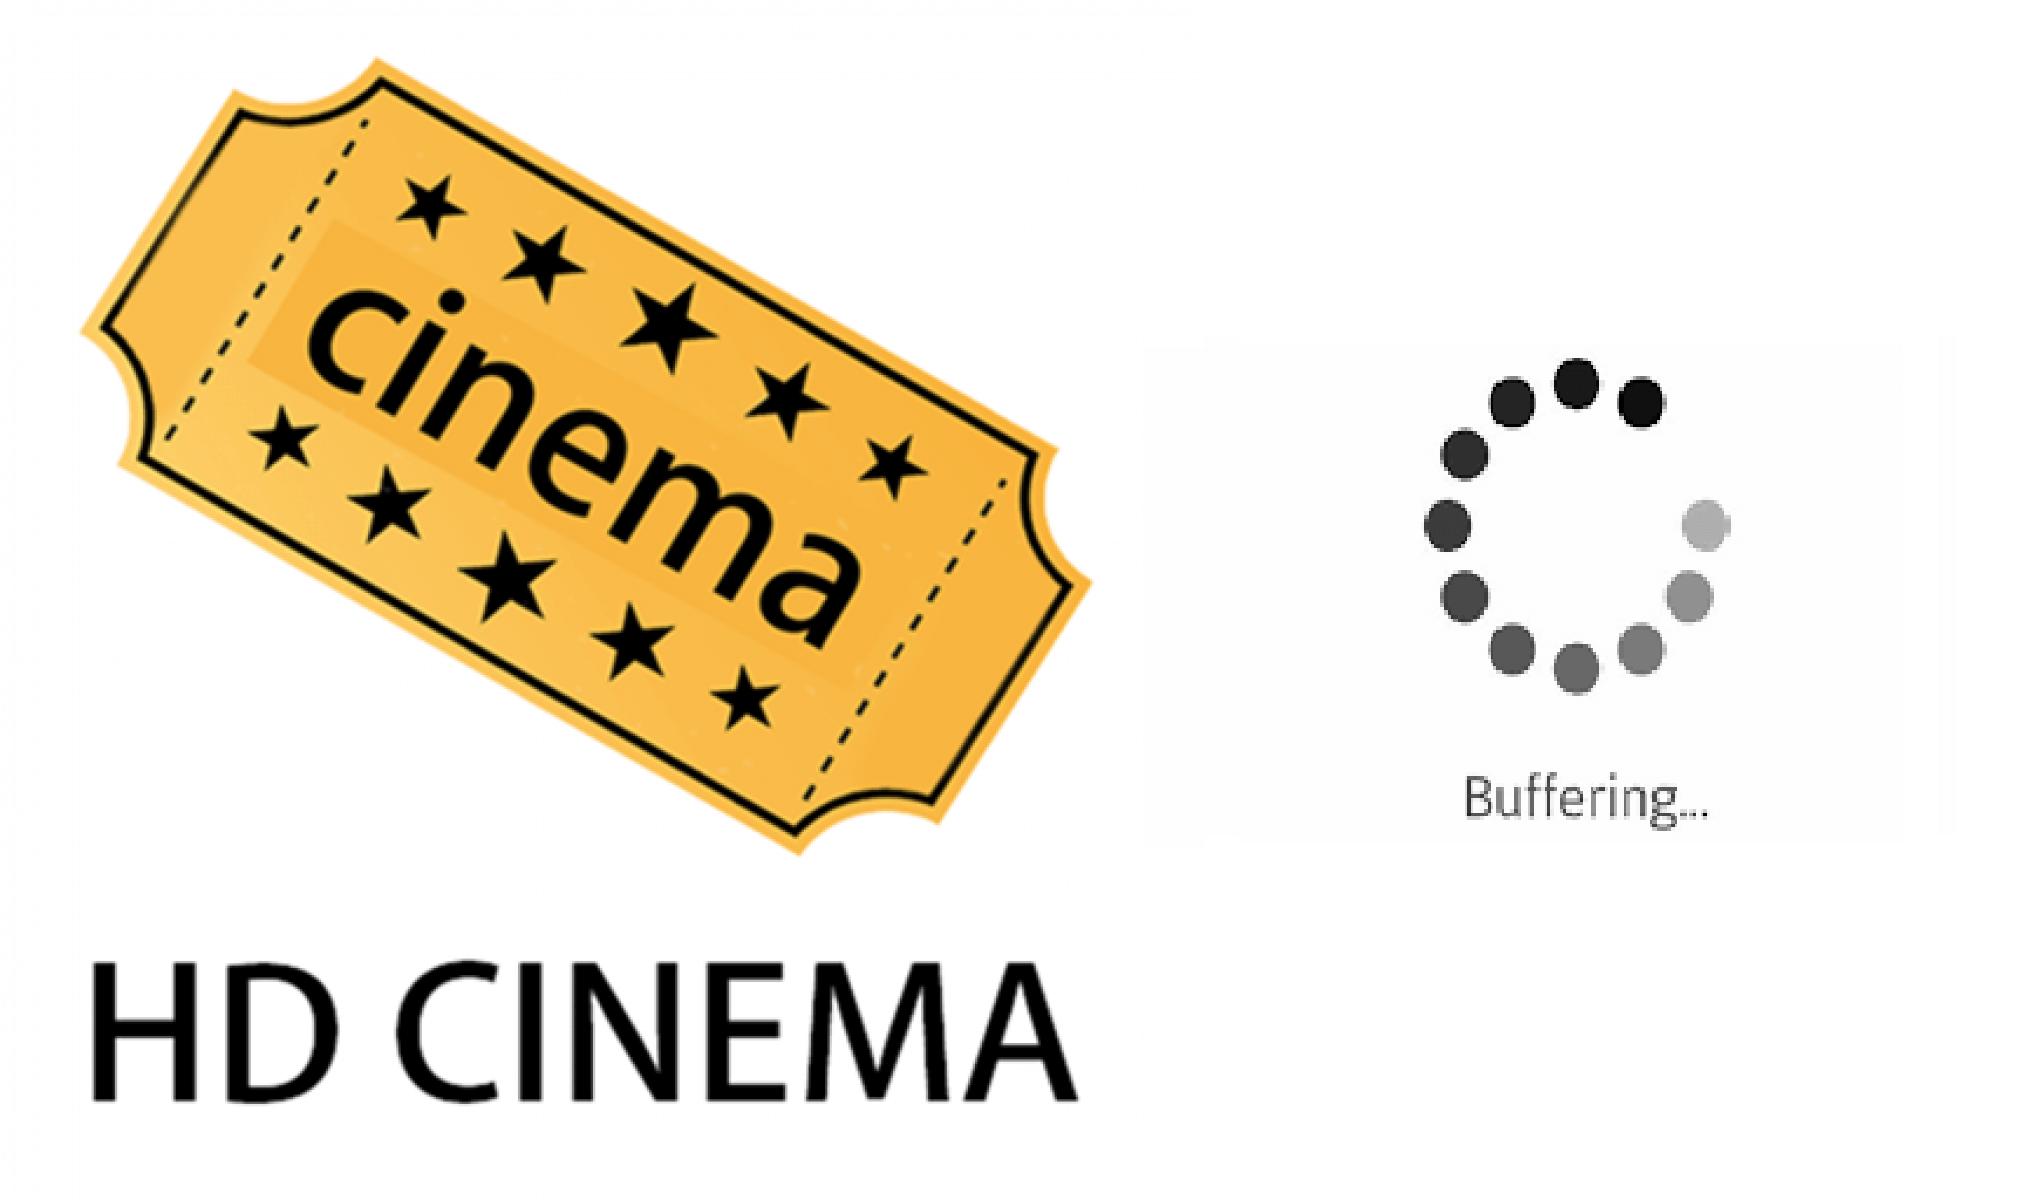 Fixed: Cinema Apk Buffering [4 Easy Ways]